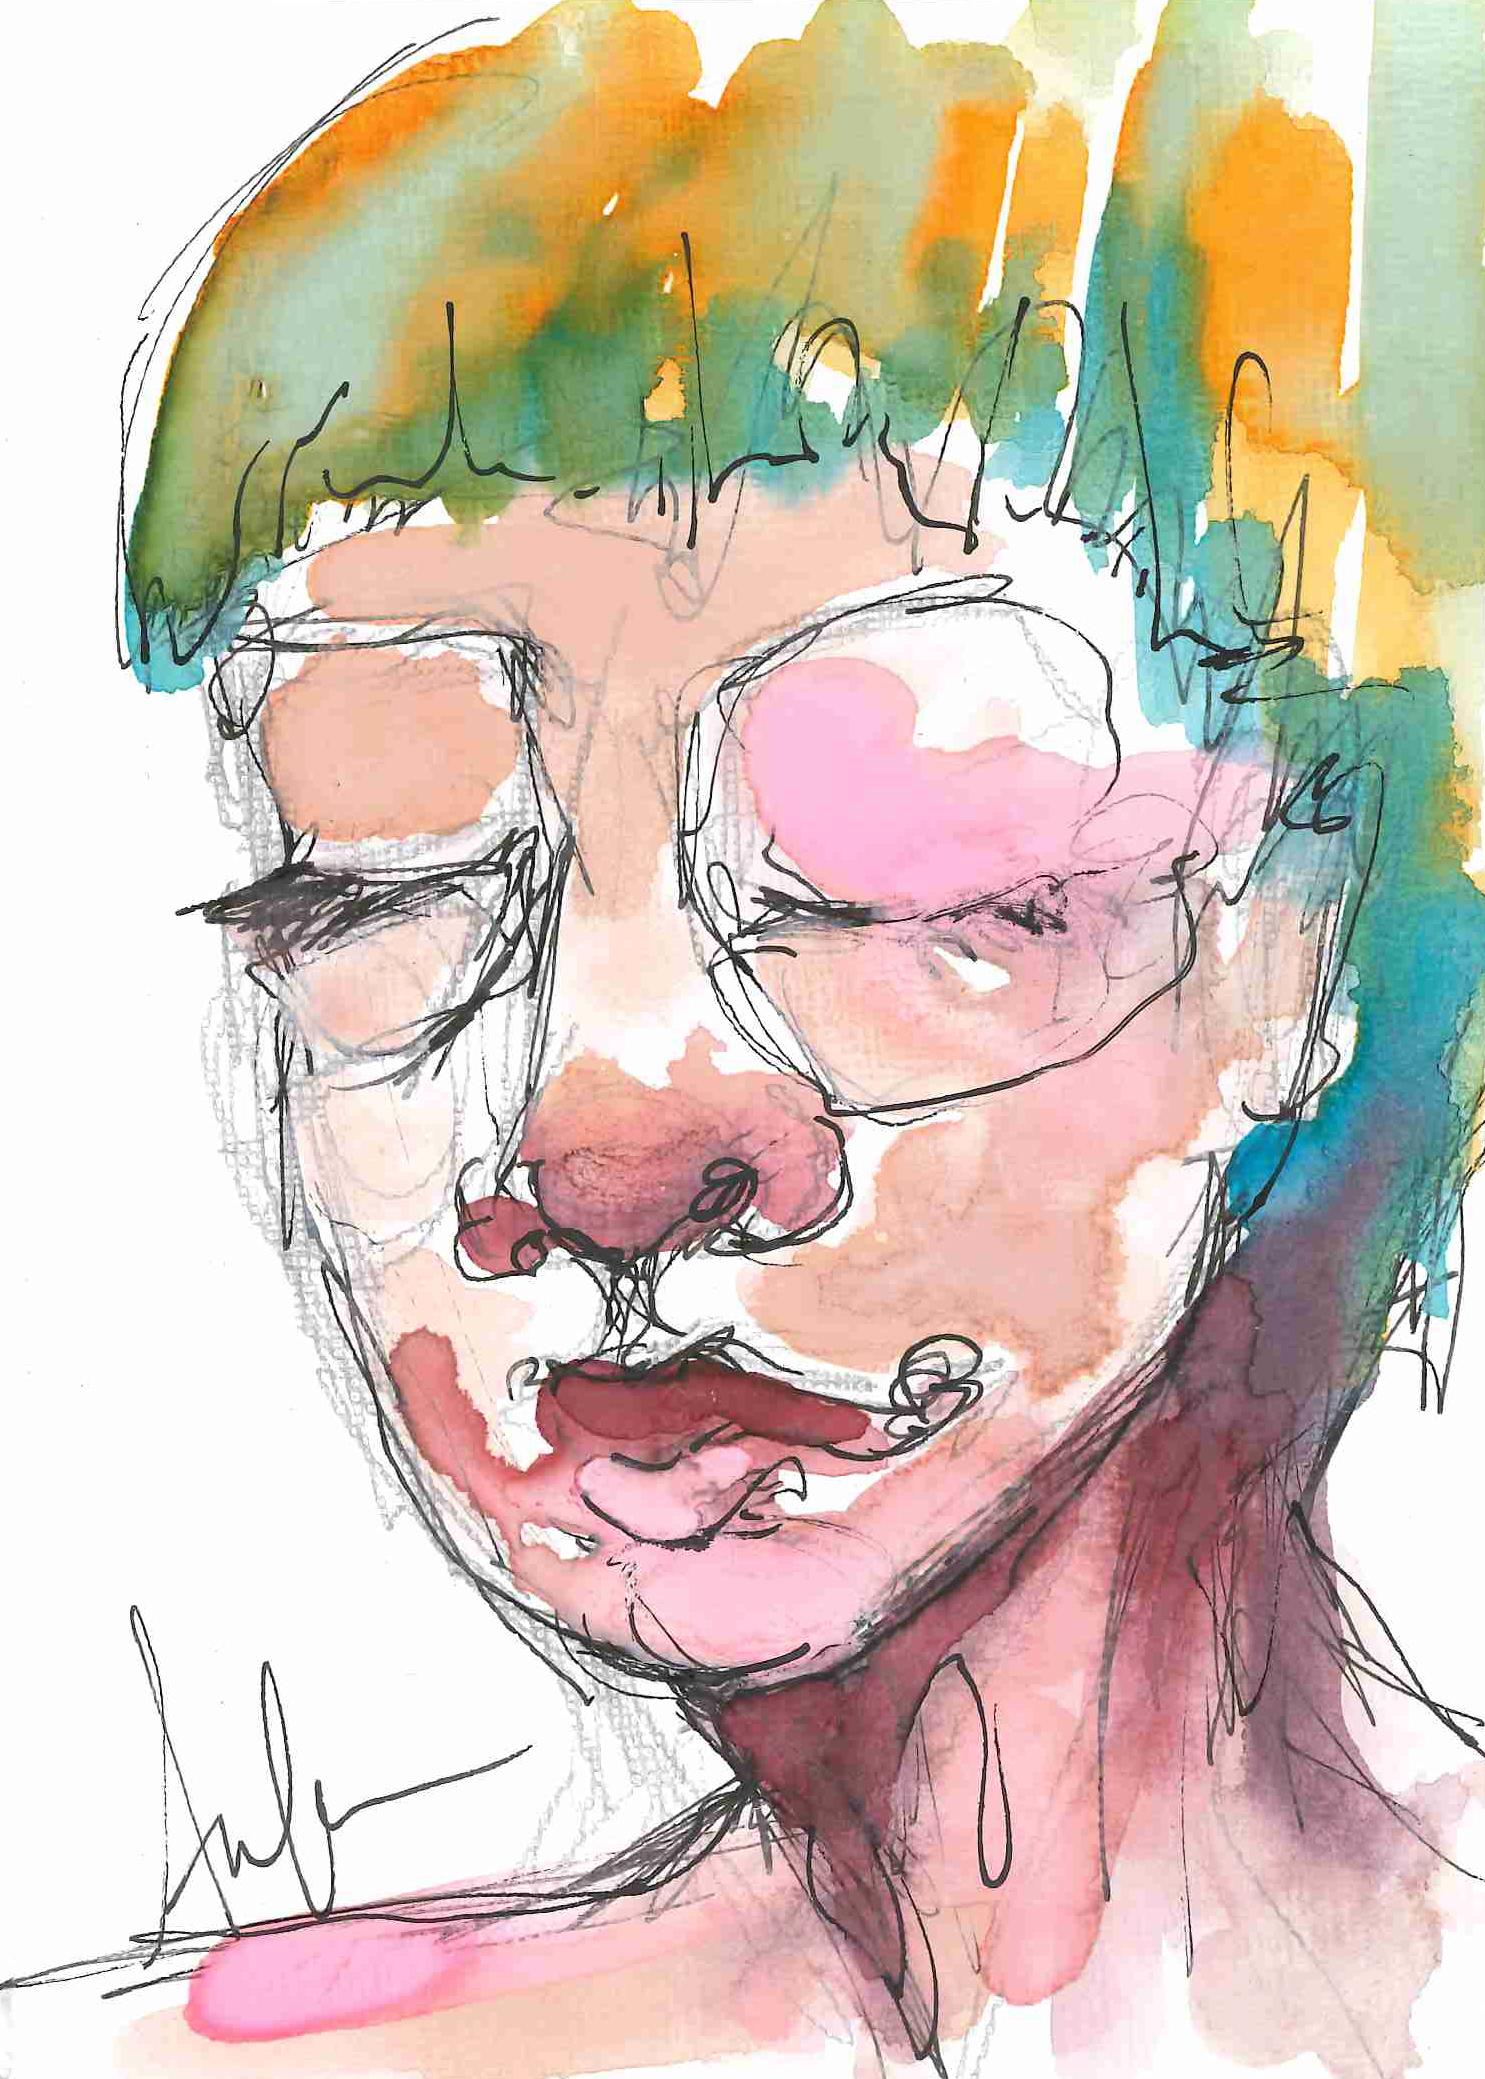 annahooser_5x7 watercolor 2018 (4)